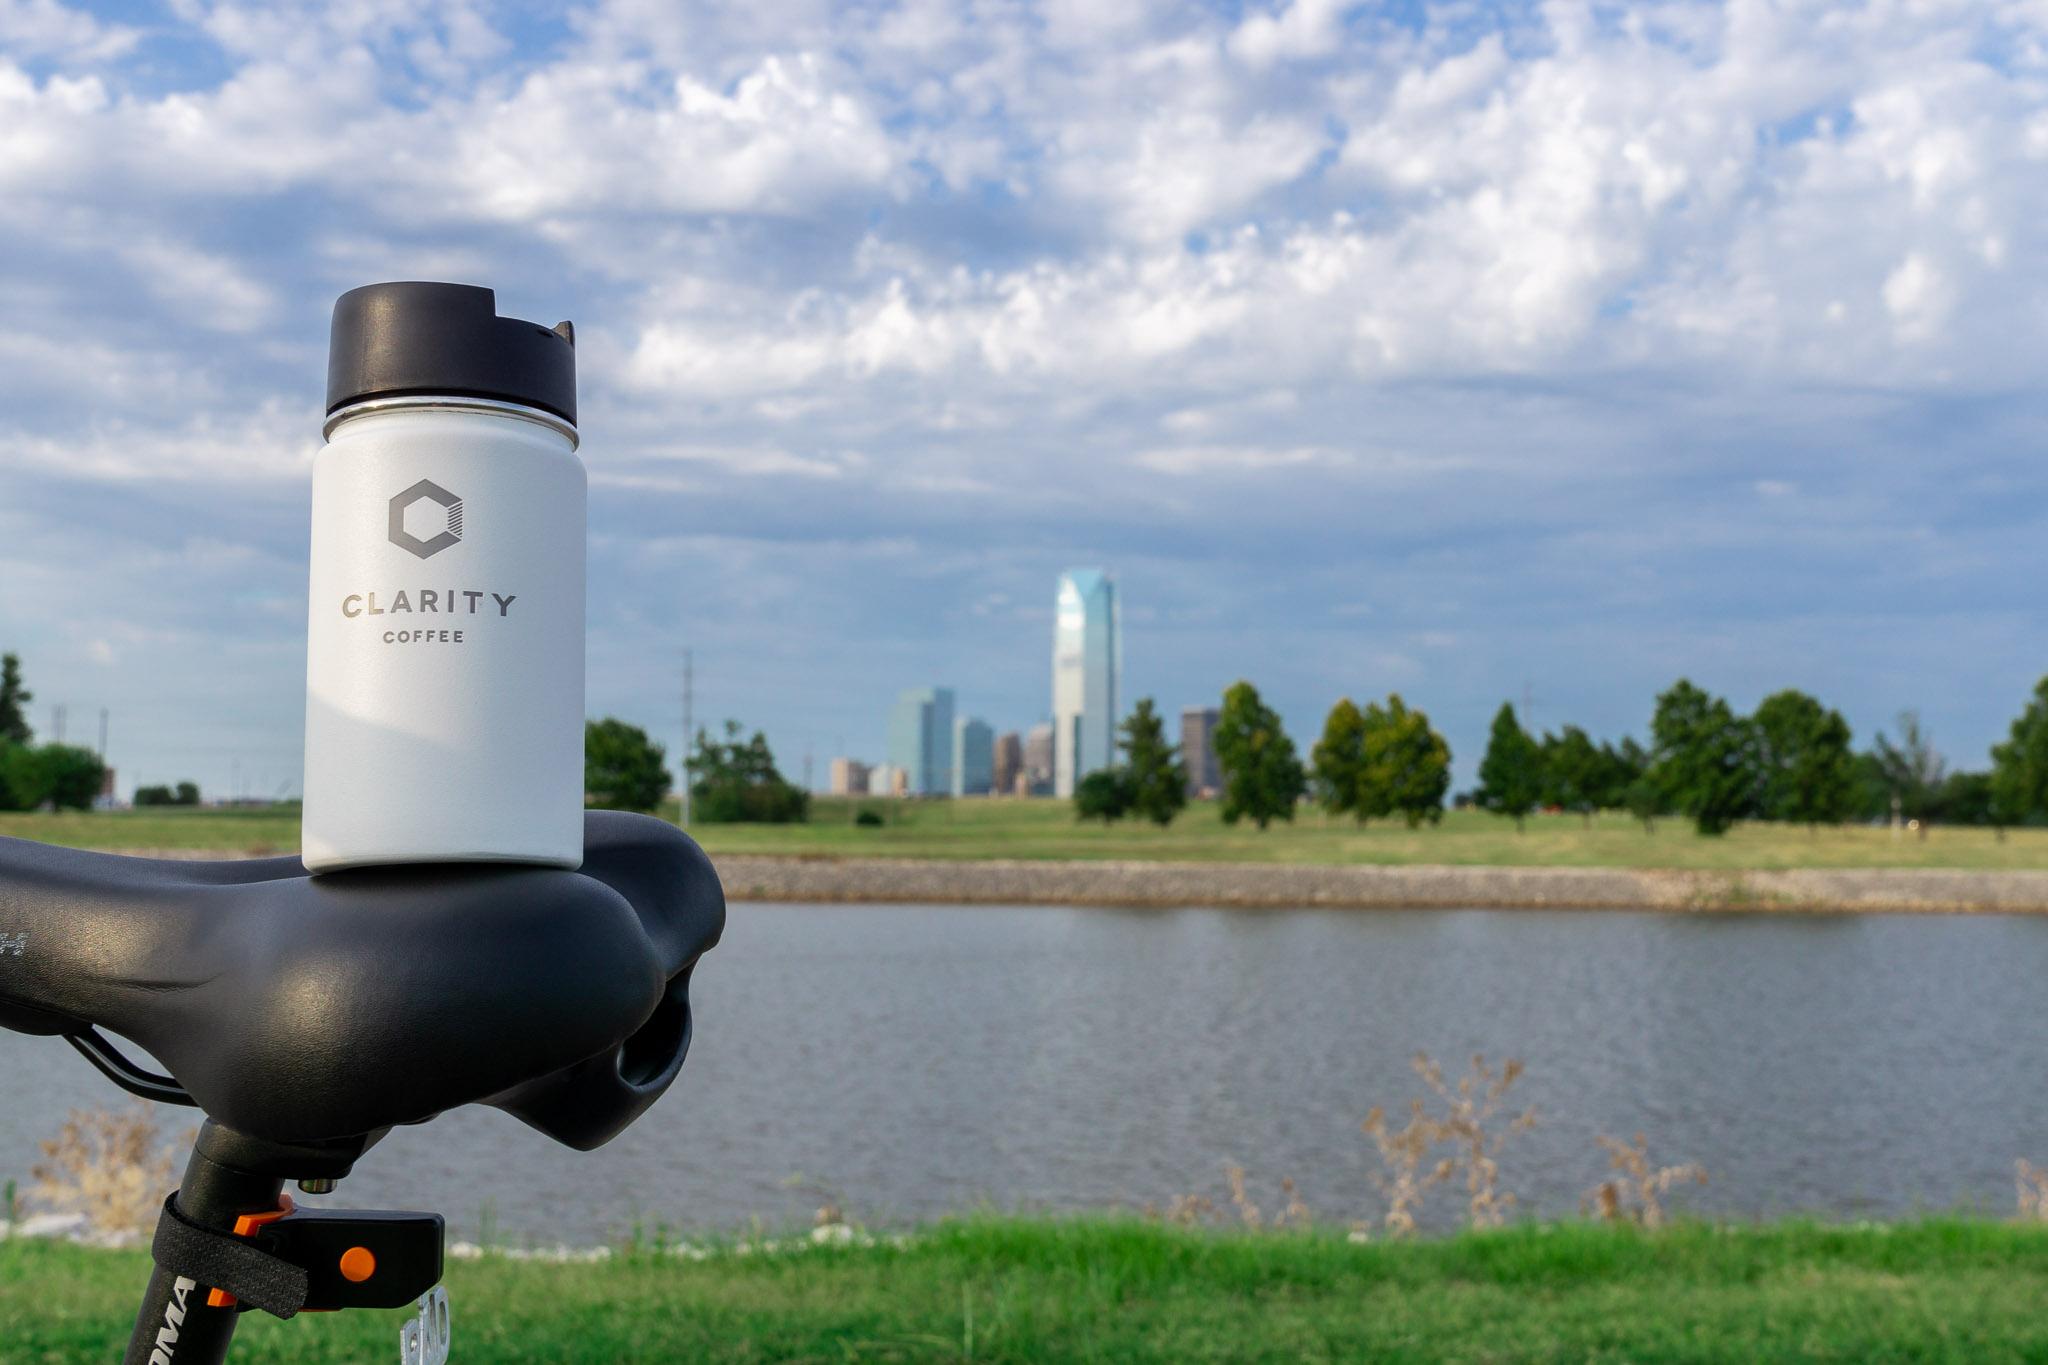 Clarity Coffee and Bike Trails